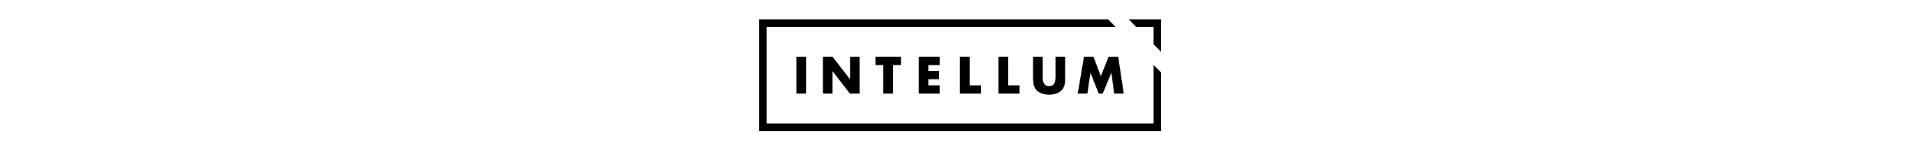 Intellum